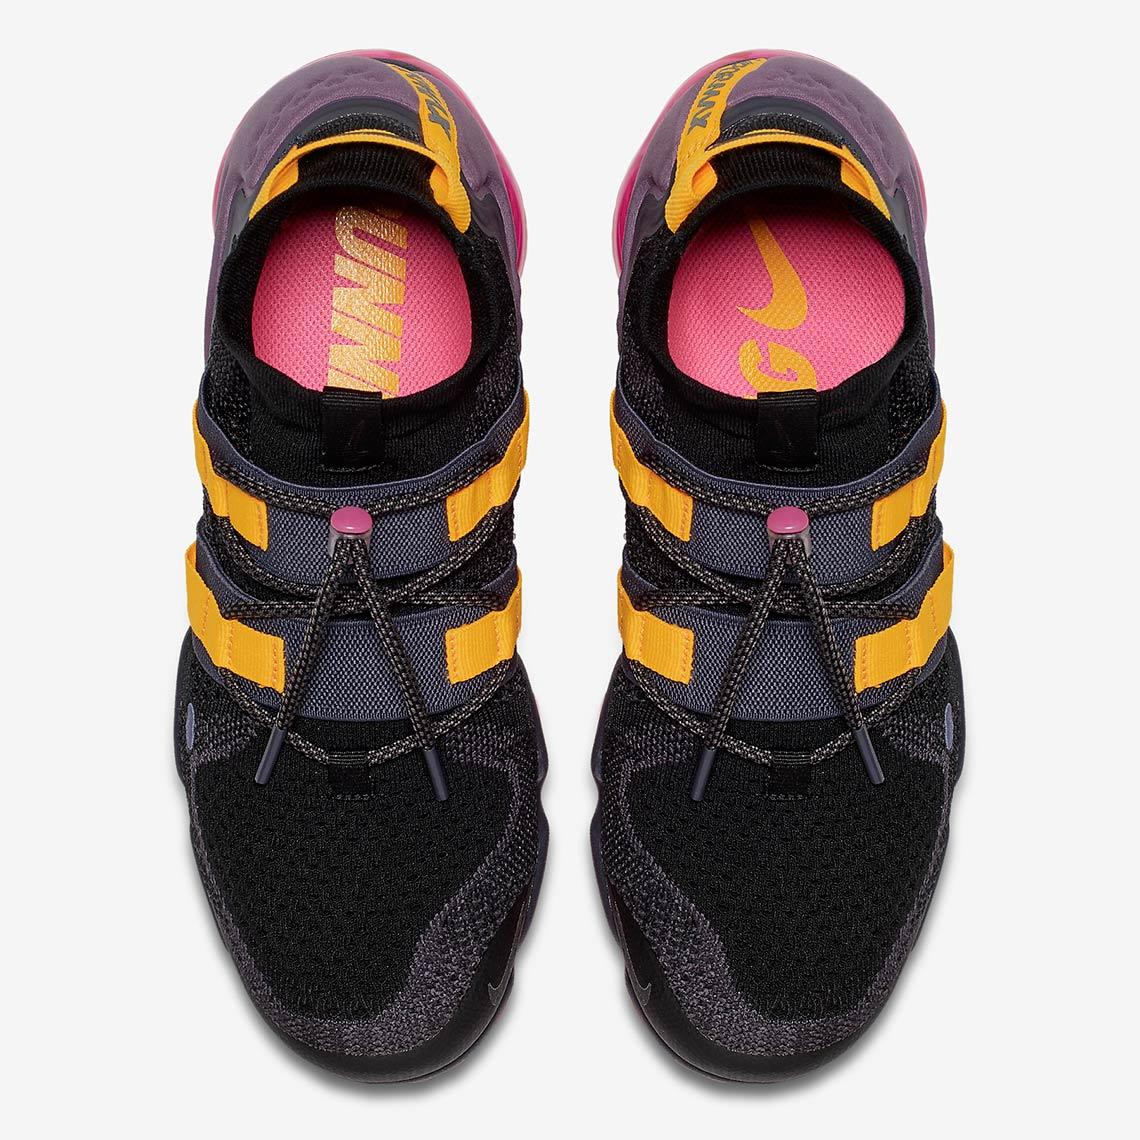 Nike Vapormax Utility Pink Blast AH6834